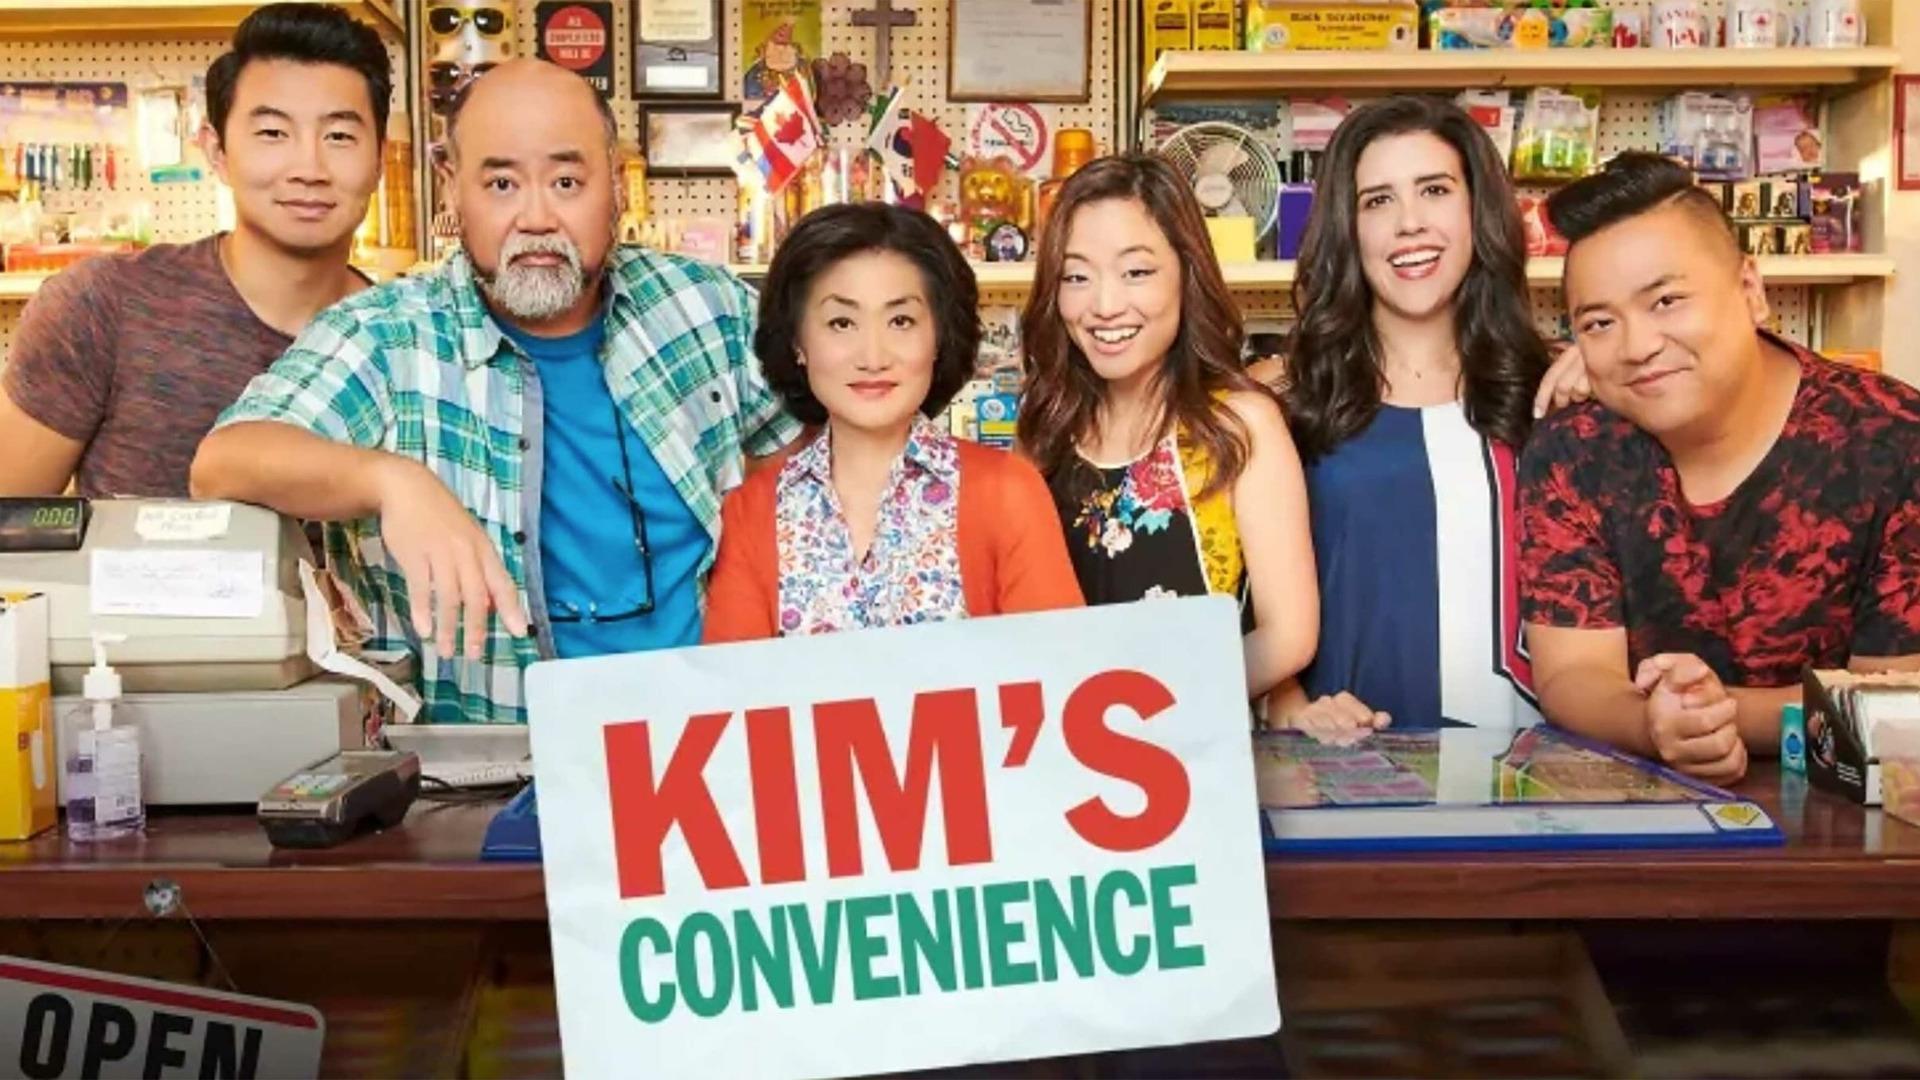 Show Kim's Convenience